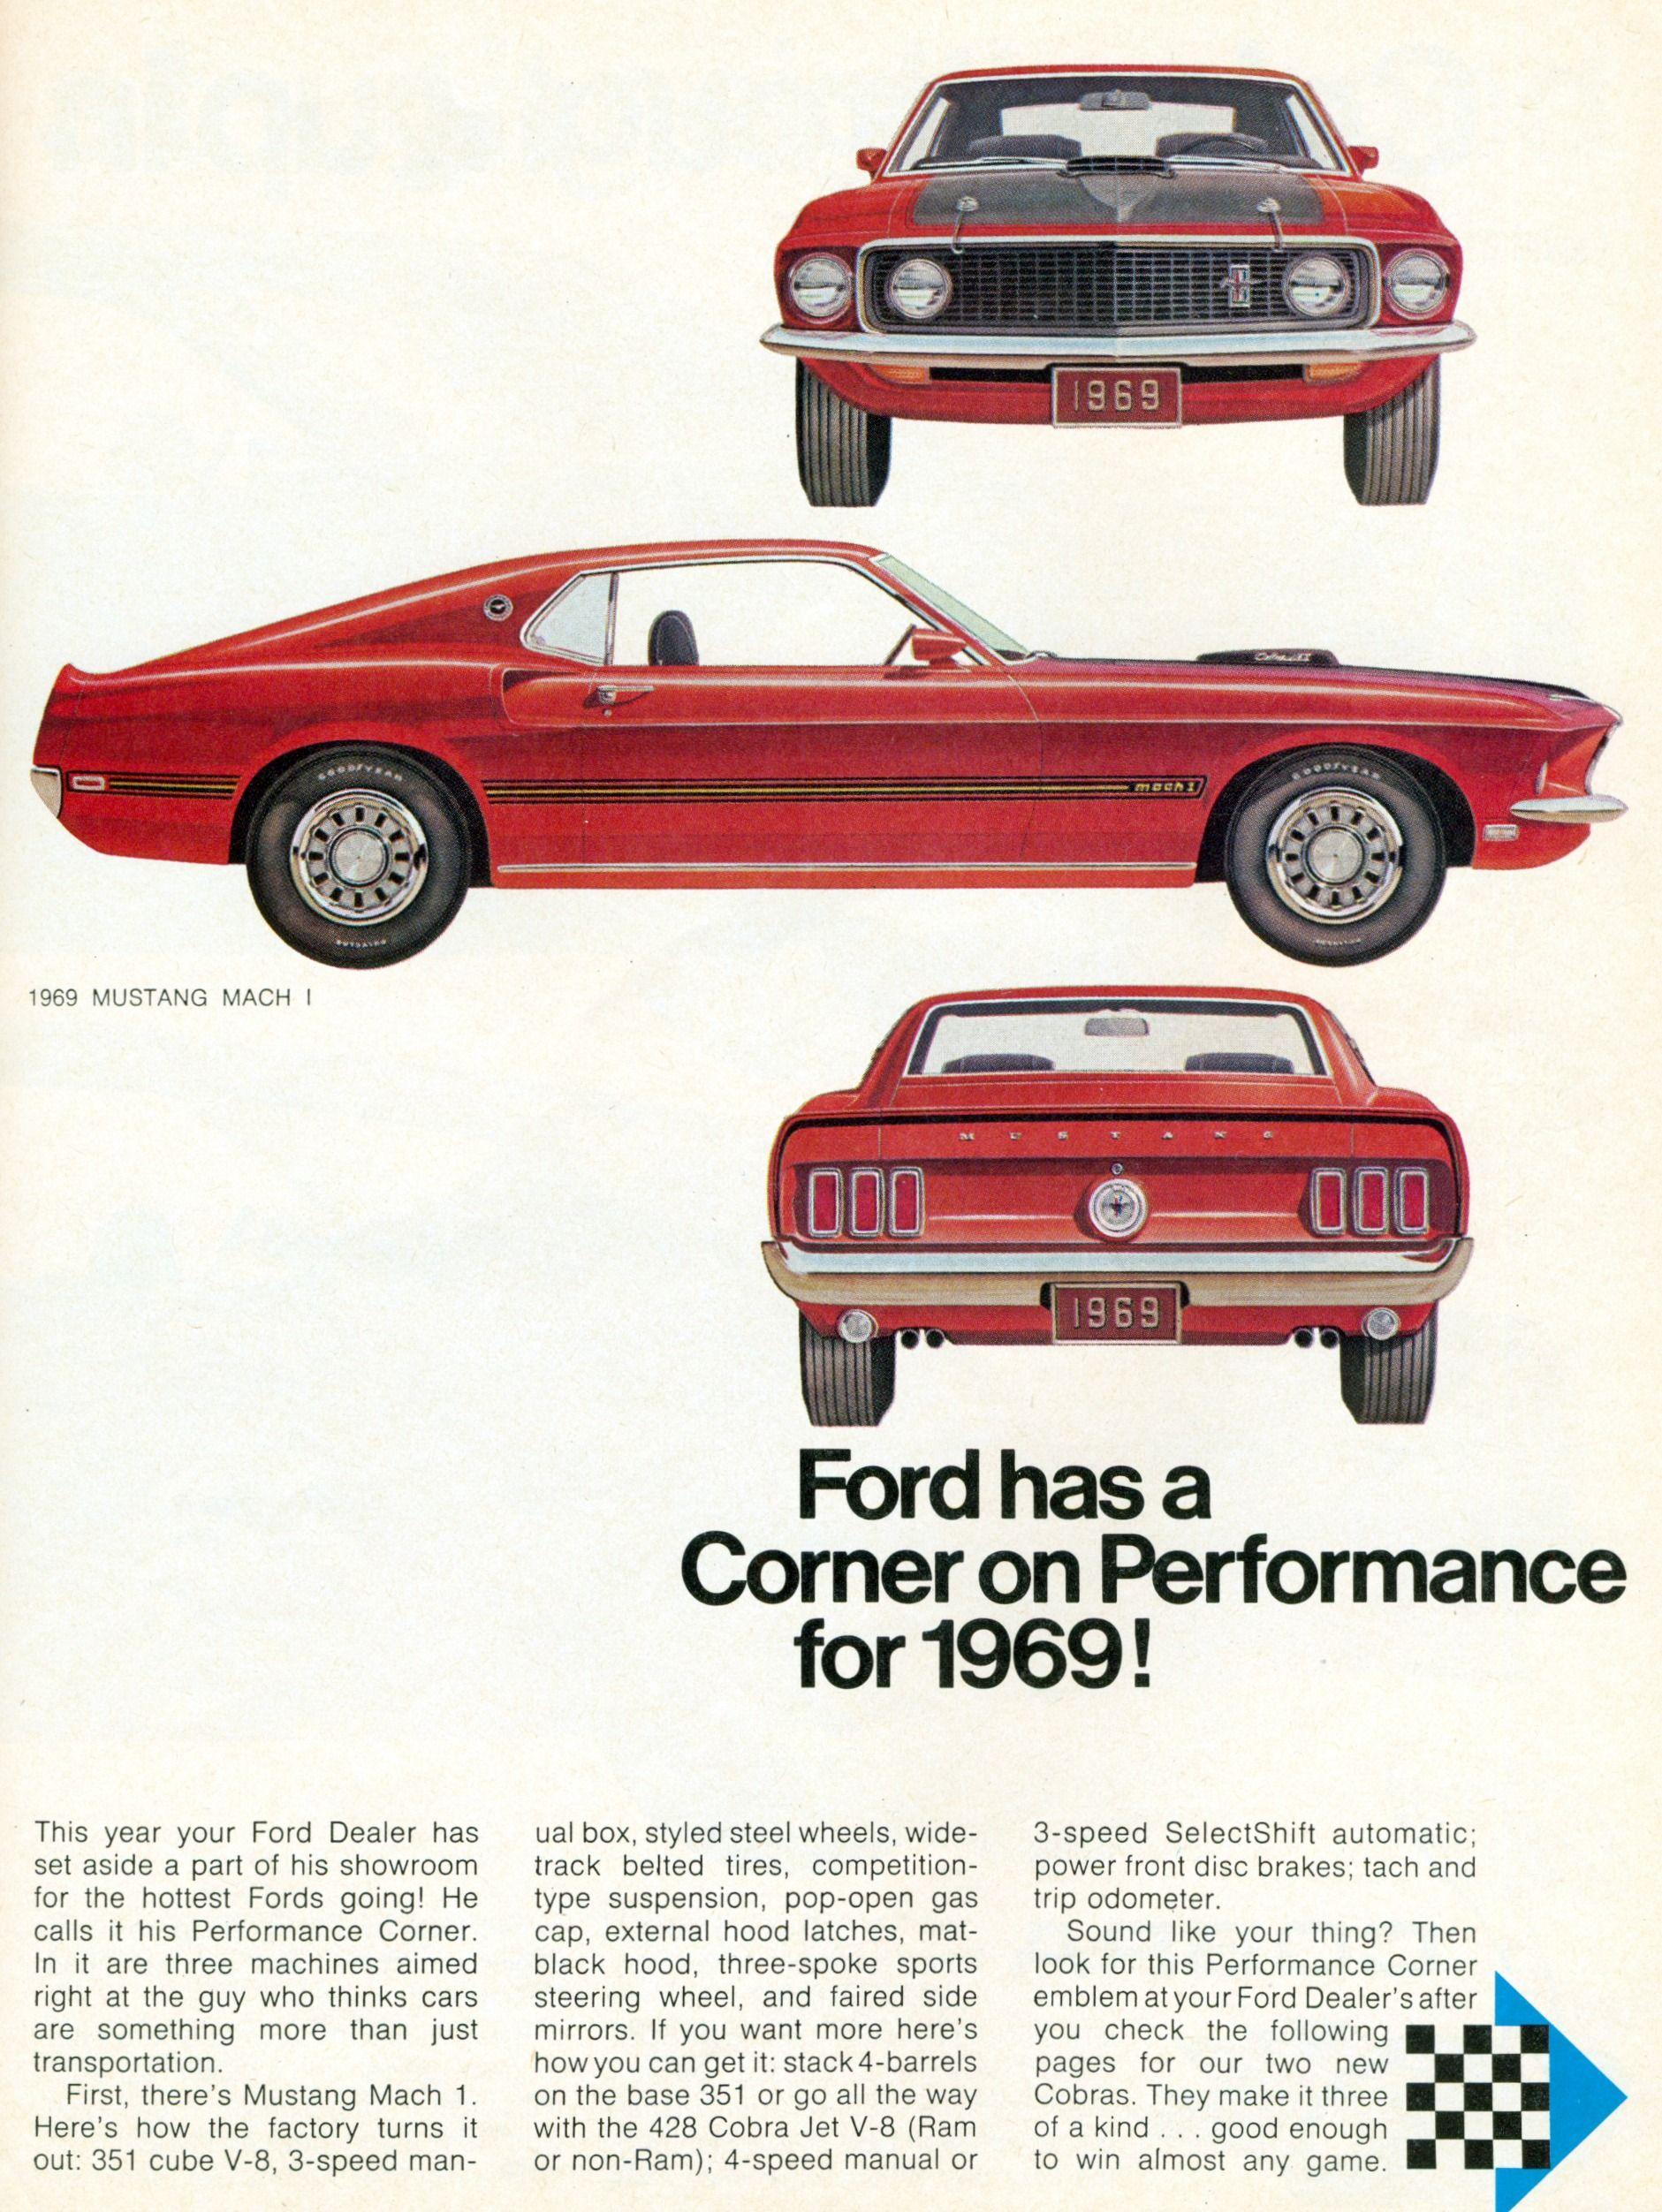 1969 mustang mach 1 corner performance mustangvintagecars